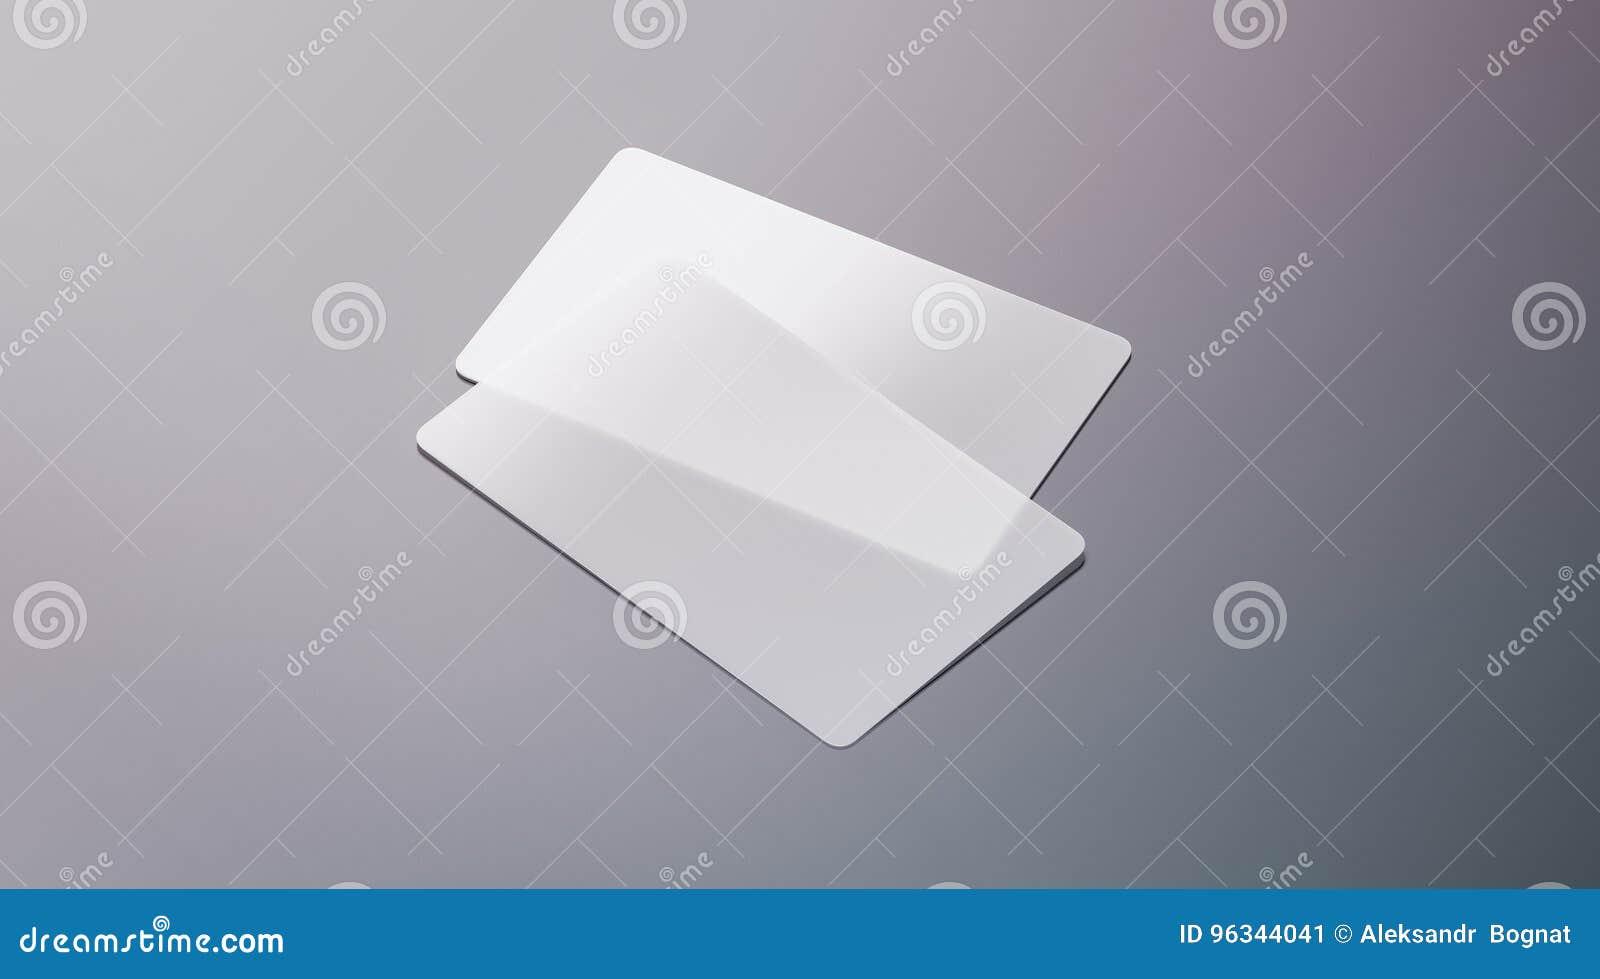 Blank Plastic Transparent Business Cards Mock Up Stock Image - Image ...